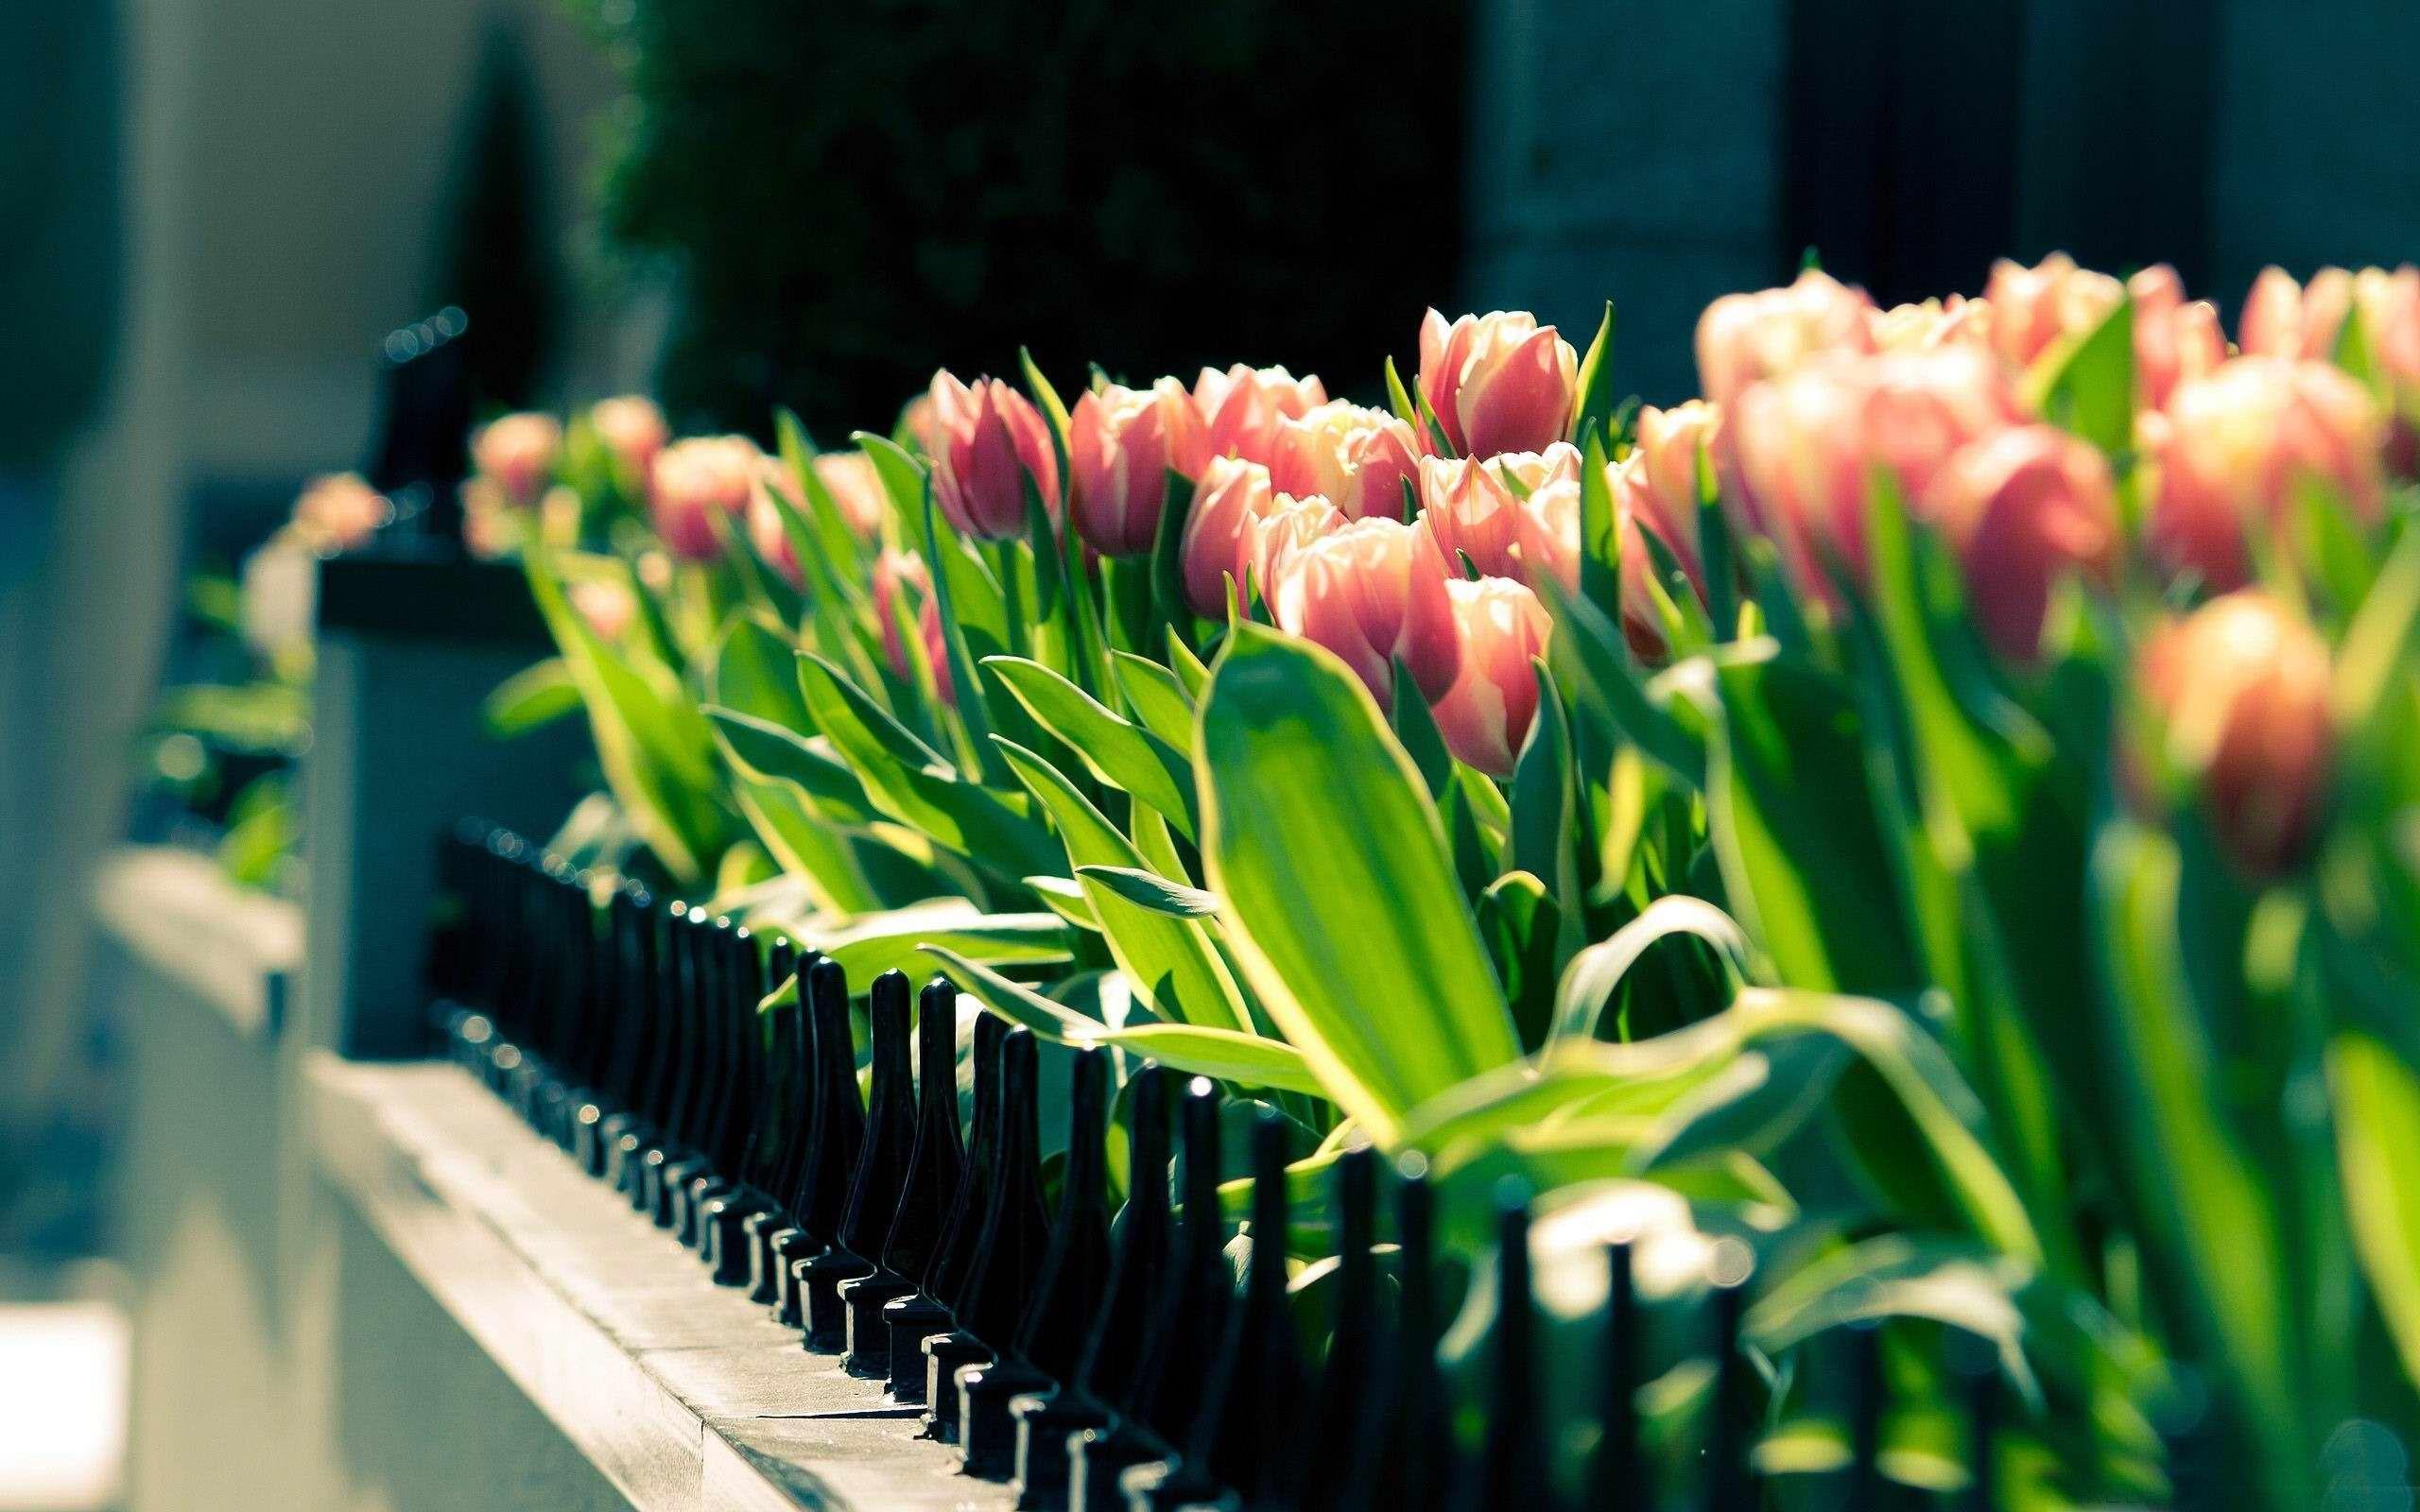 Spring Wallpaper For Desktop Spring Wallpaper High Definition On Wallpaper Hd Wallpaper Bits Spring Desktop Wallpaper Flowers Photography Flower Wallpaper